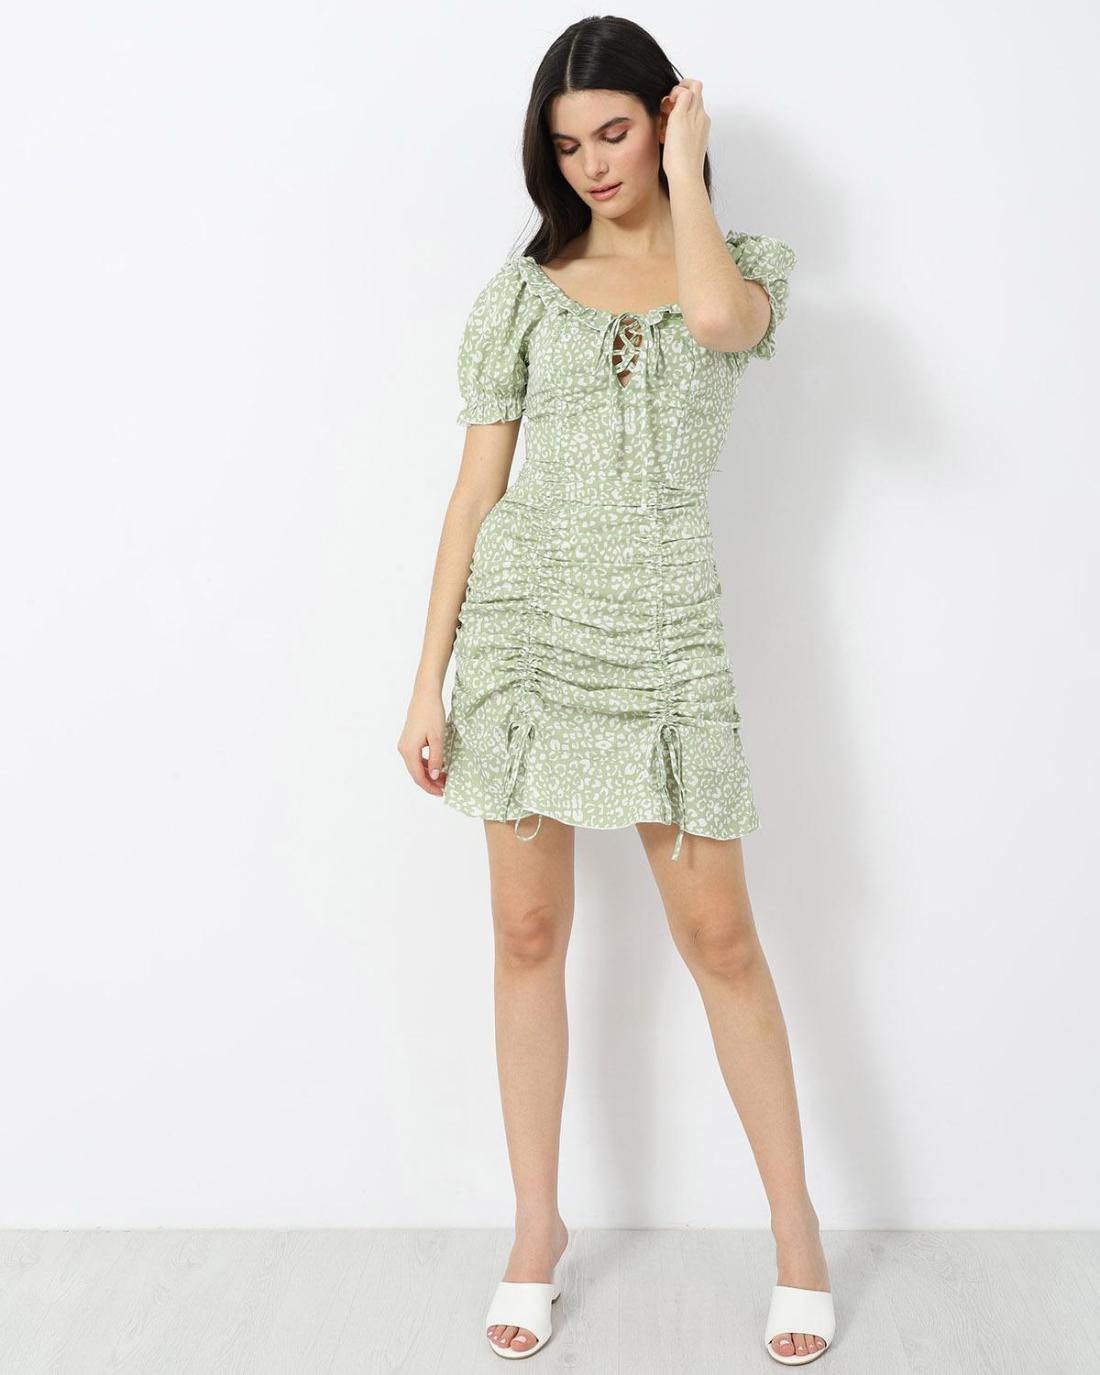 Grün mini kleid